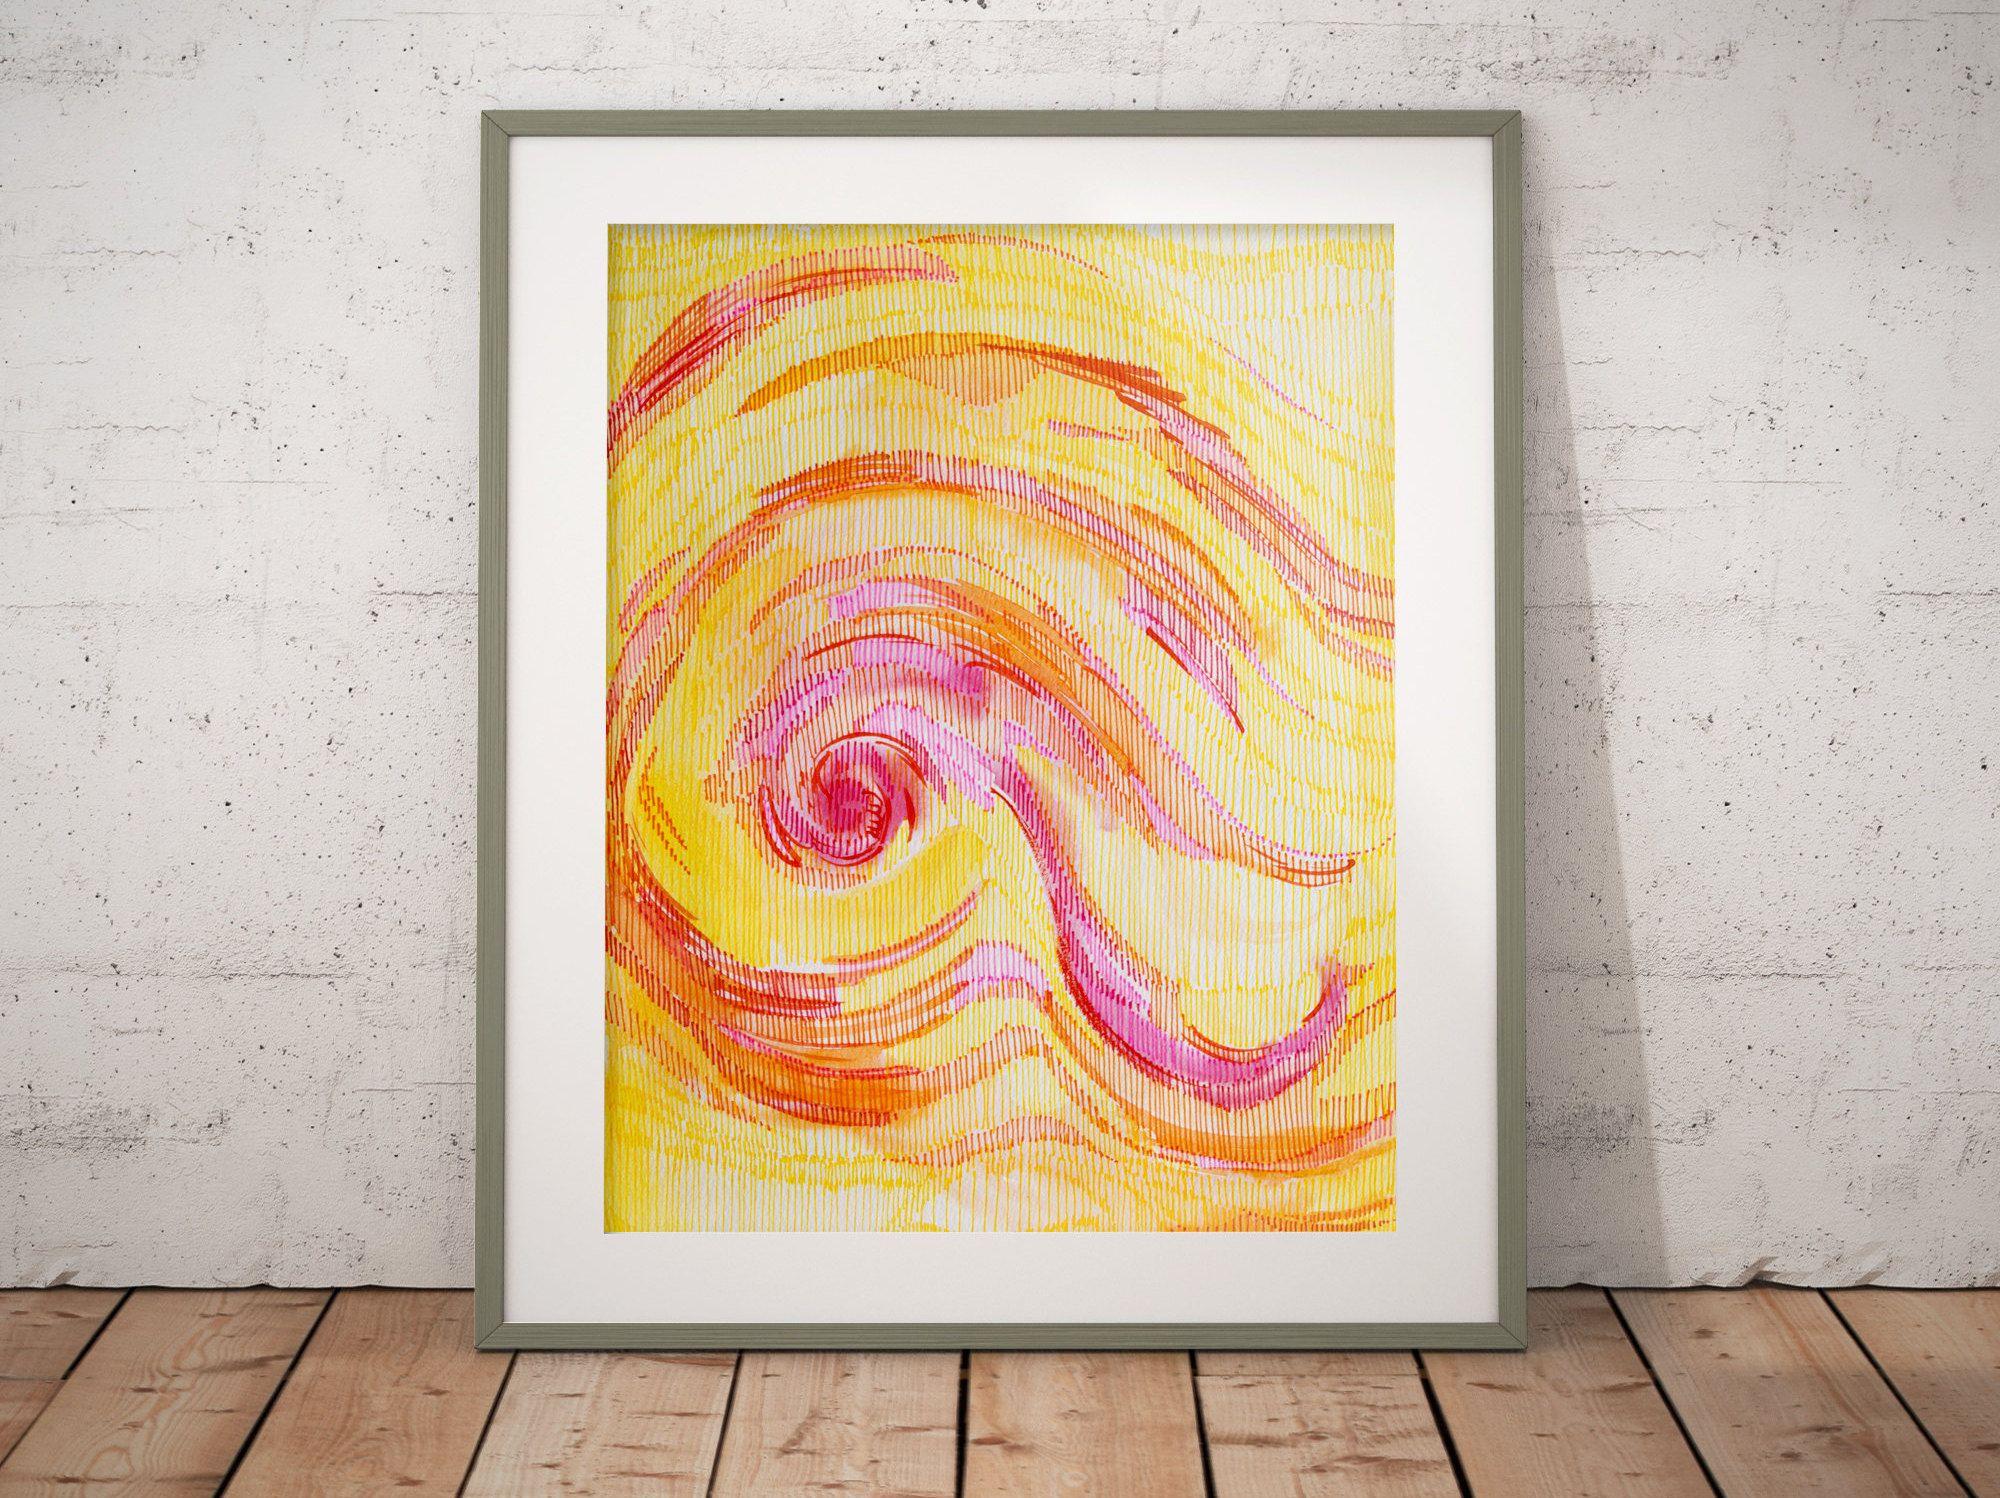 Abstract art gallery wall decor,original art prints,handpainted ...